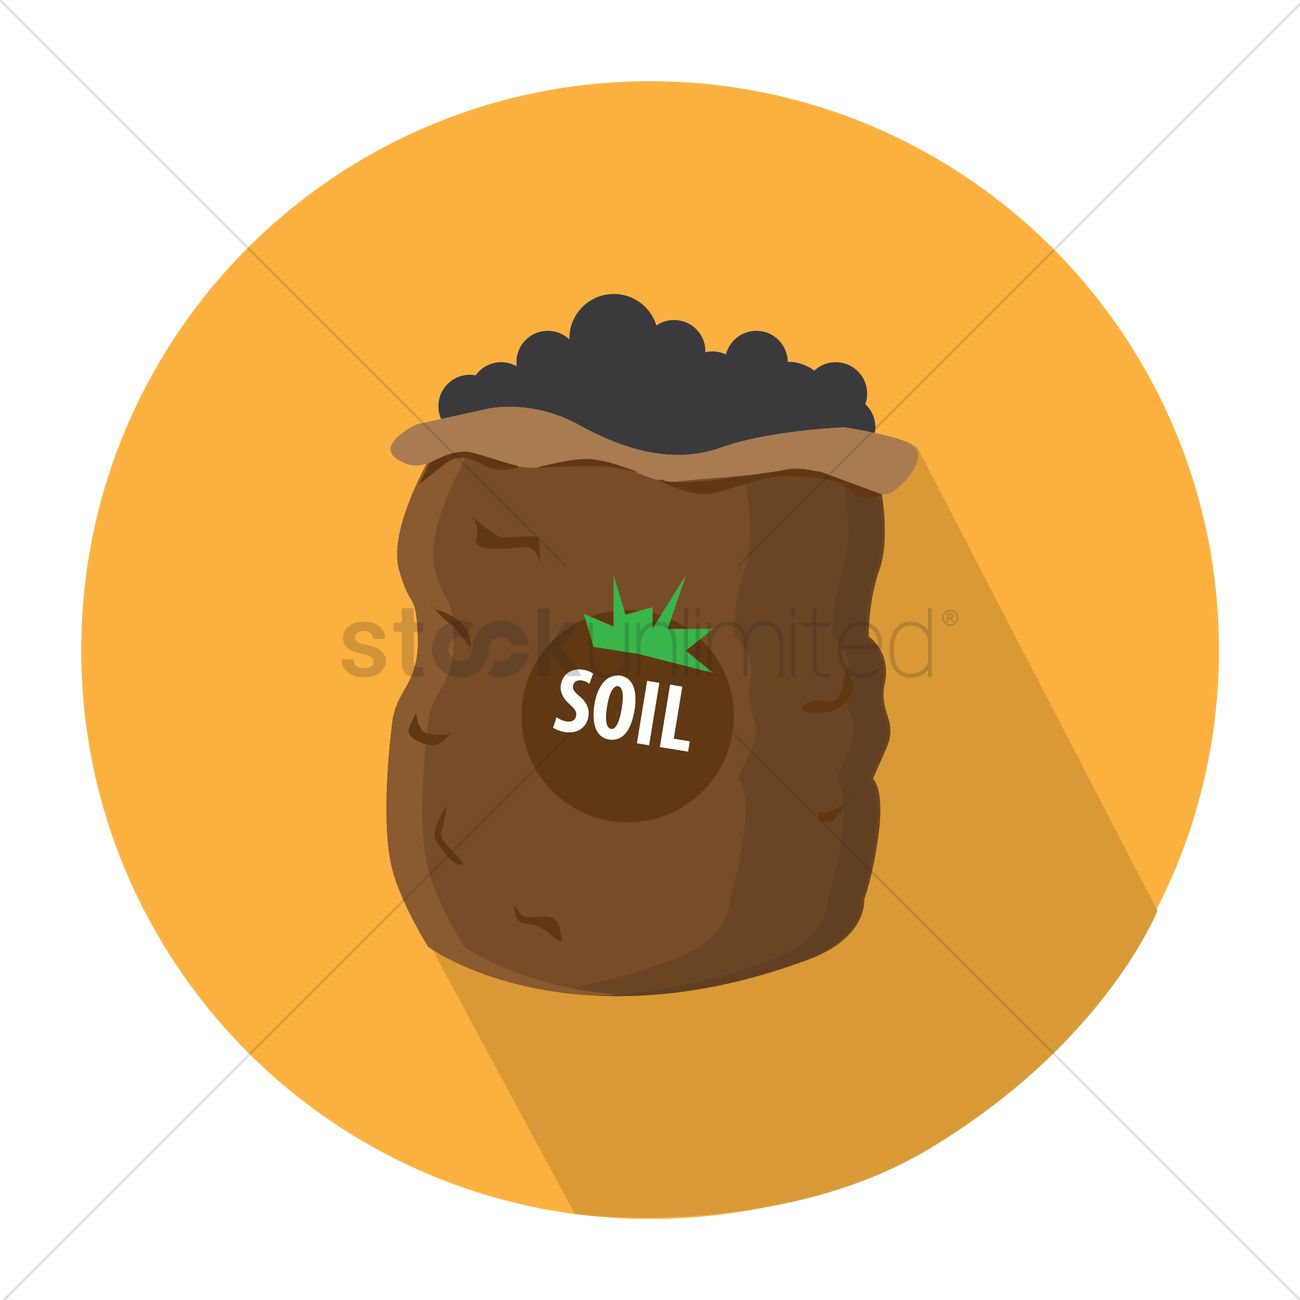 soil clipart - Jaxstorm.realverse.us